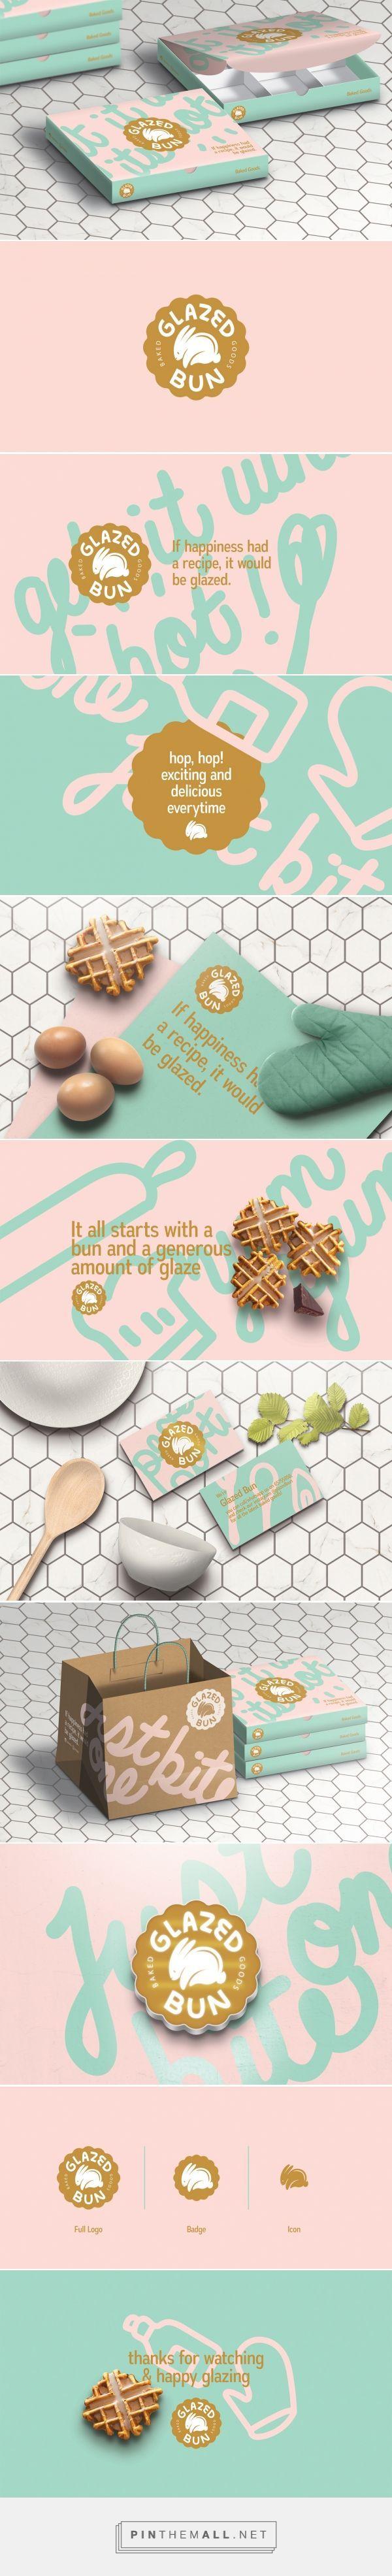 Glazed Bun Branding by Studio AIO on Behance